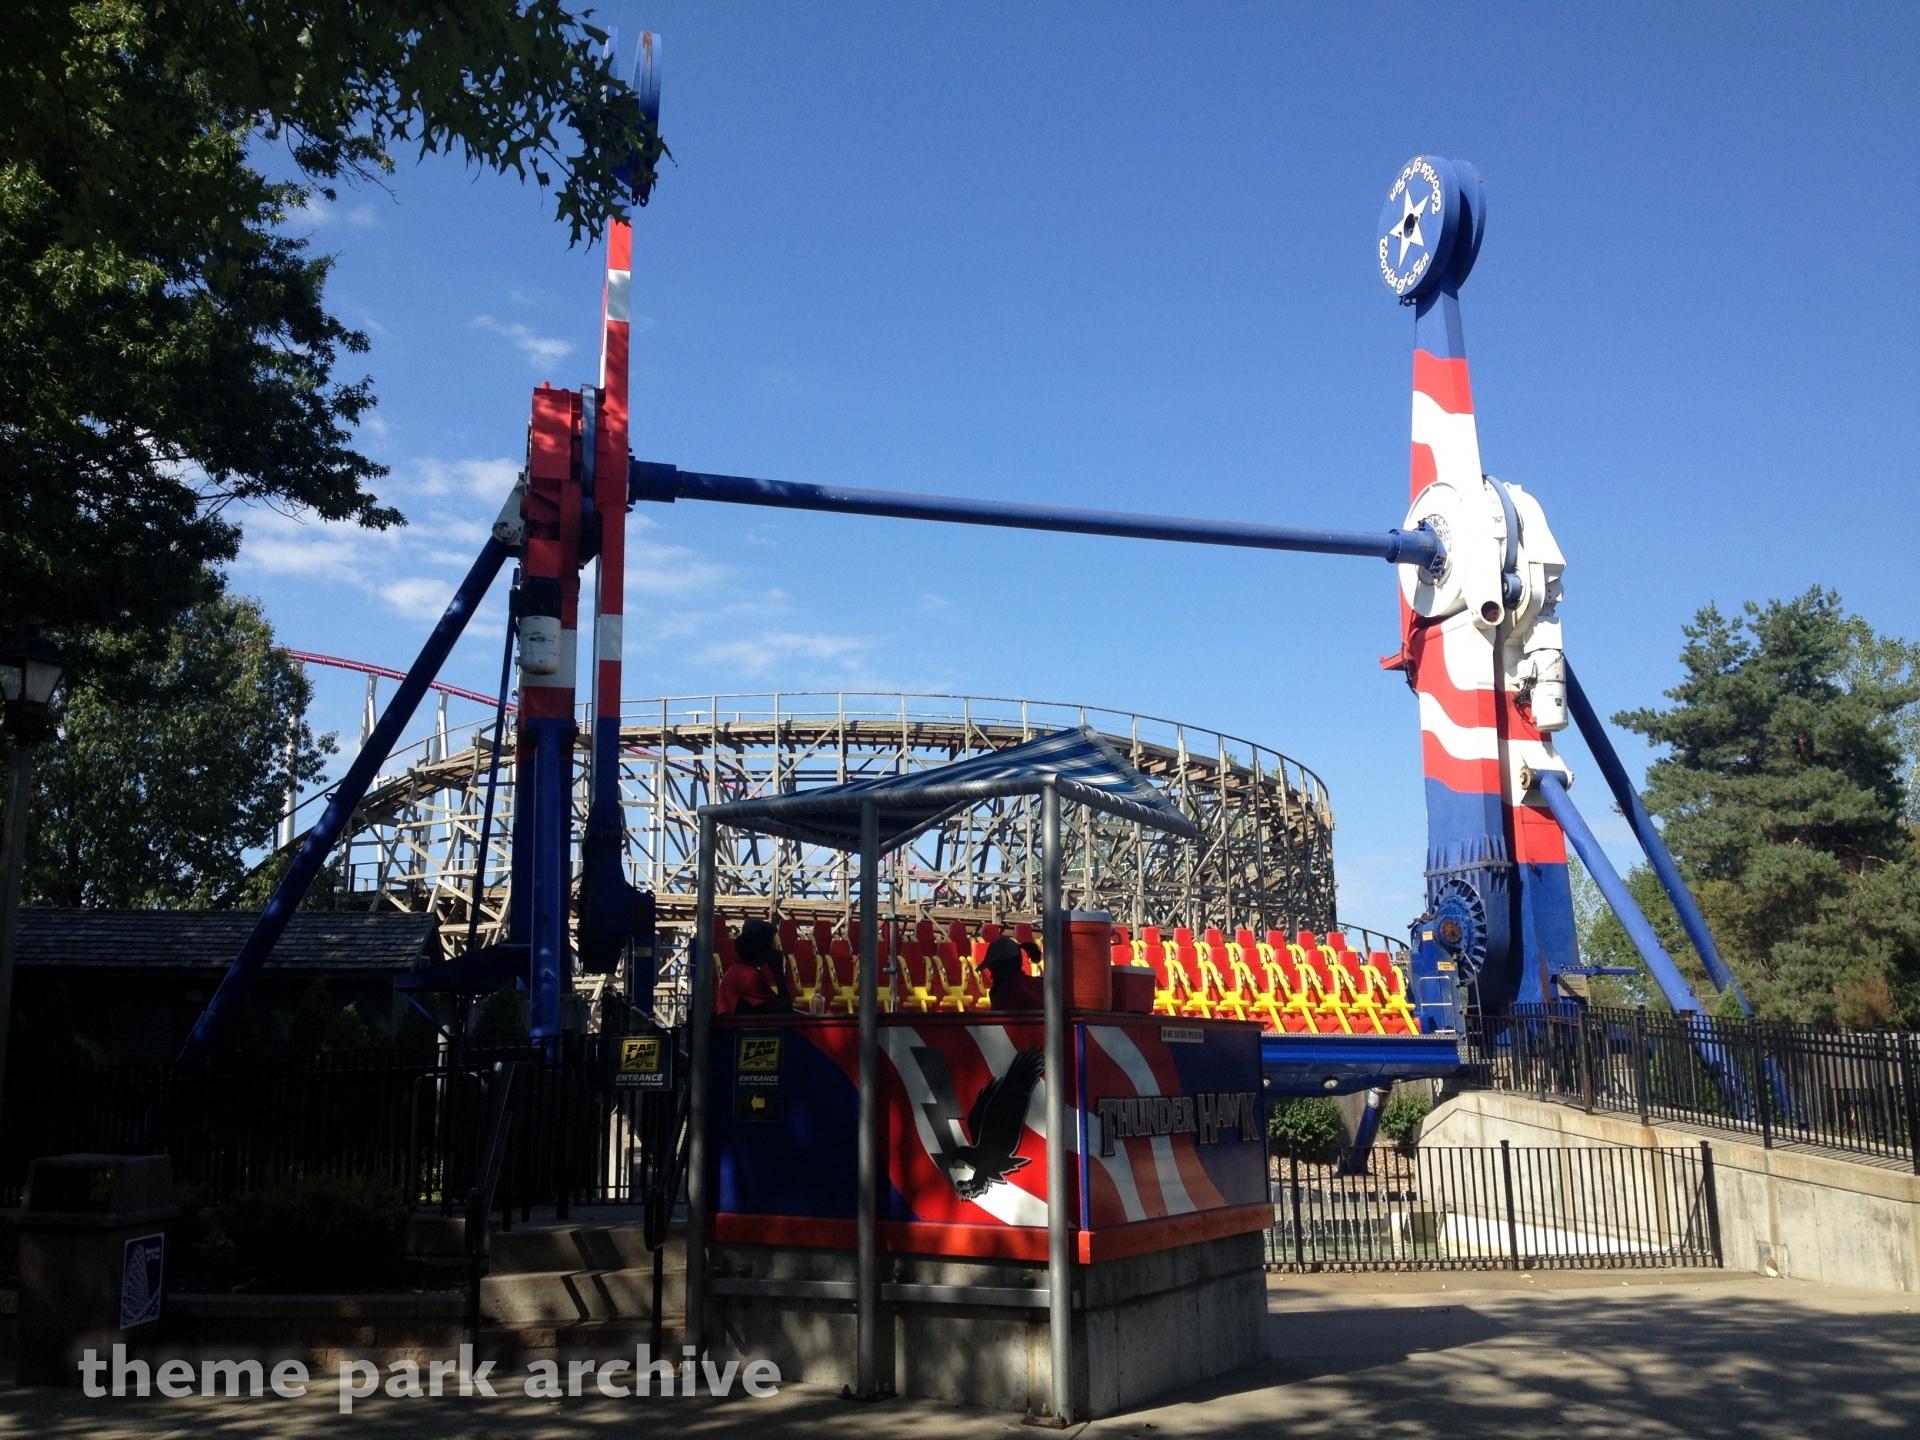 Thunderhawk at Worlds of Fun